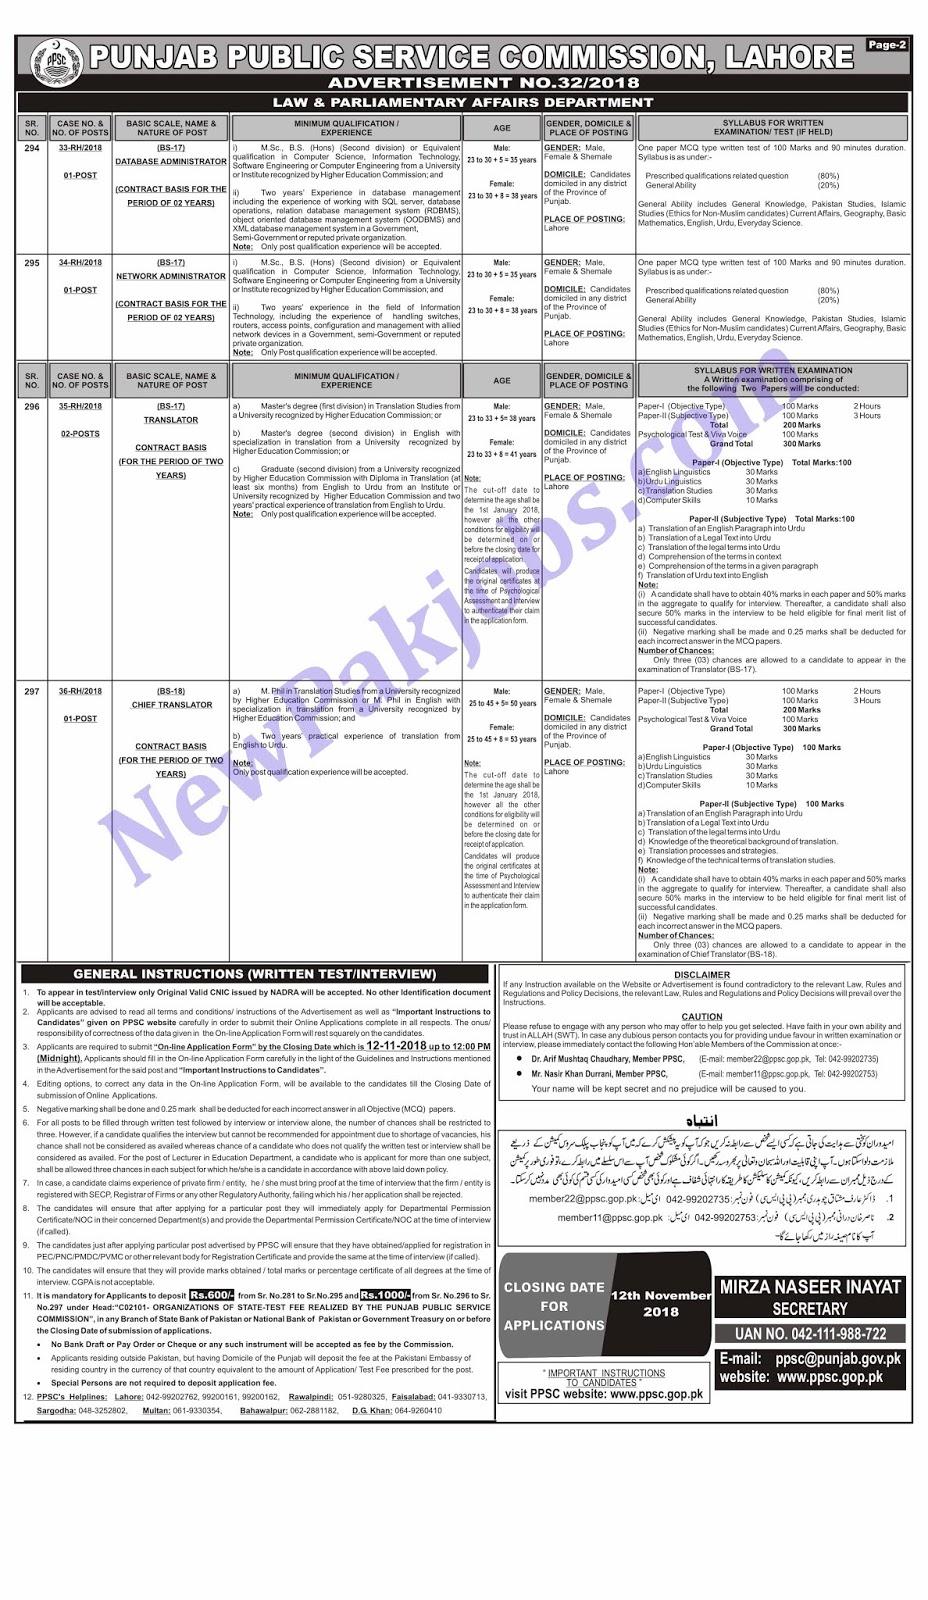 ppsc-jobs-advertisement-no-32-2018-newpakjobs